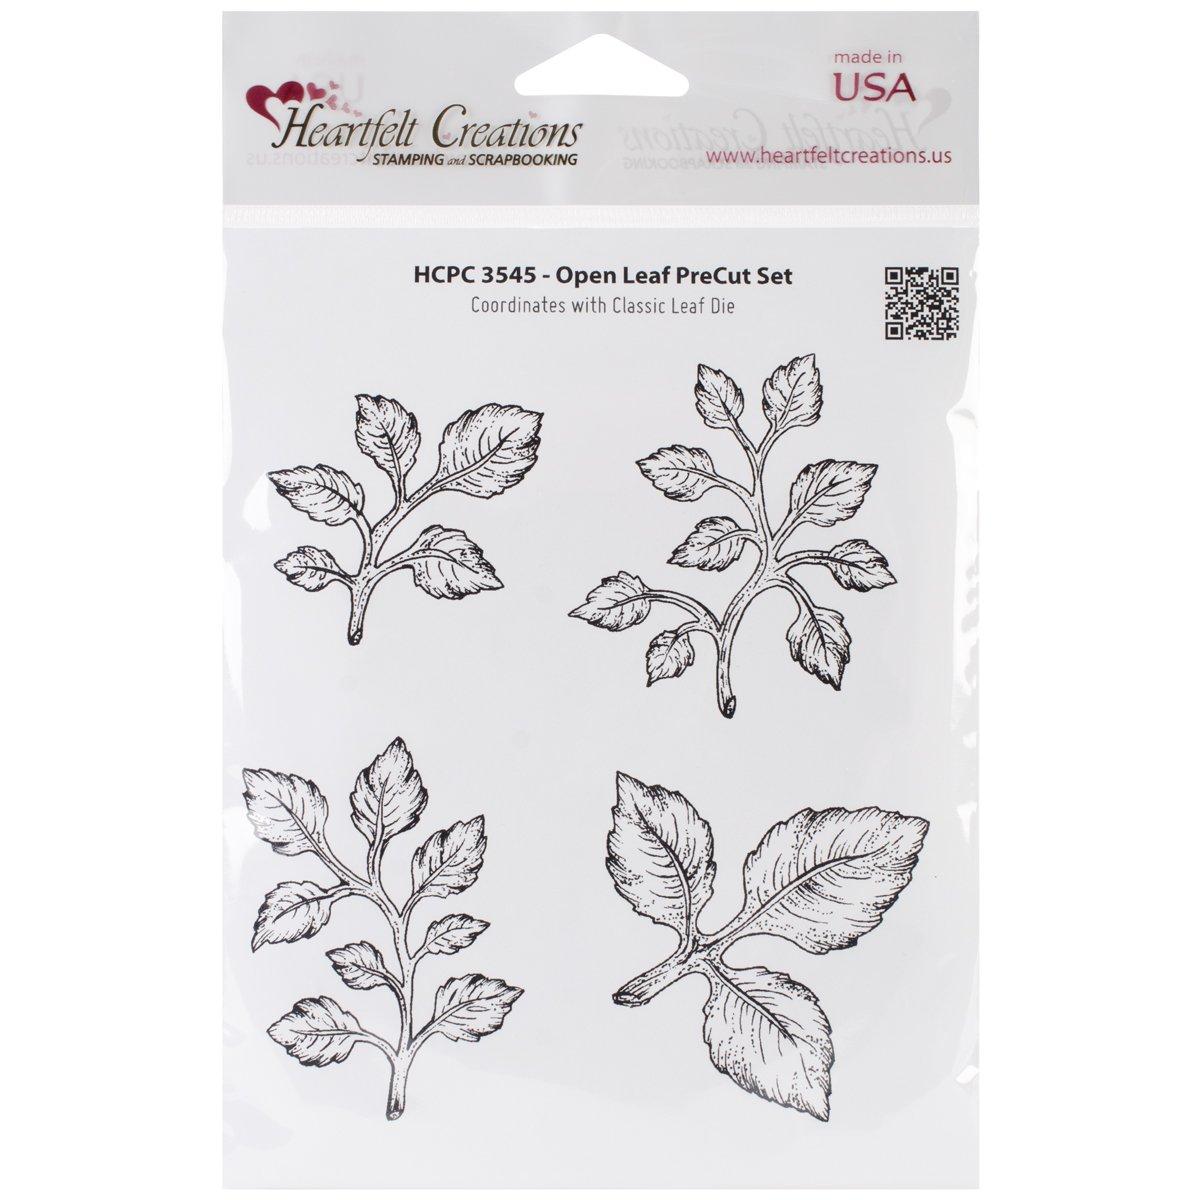 Heartfelt Creations Cling Rubber Stamp Set 5''X6.5''-Open Leaf